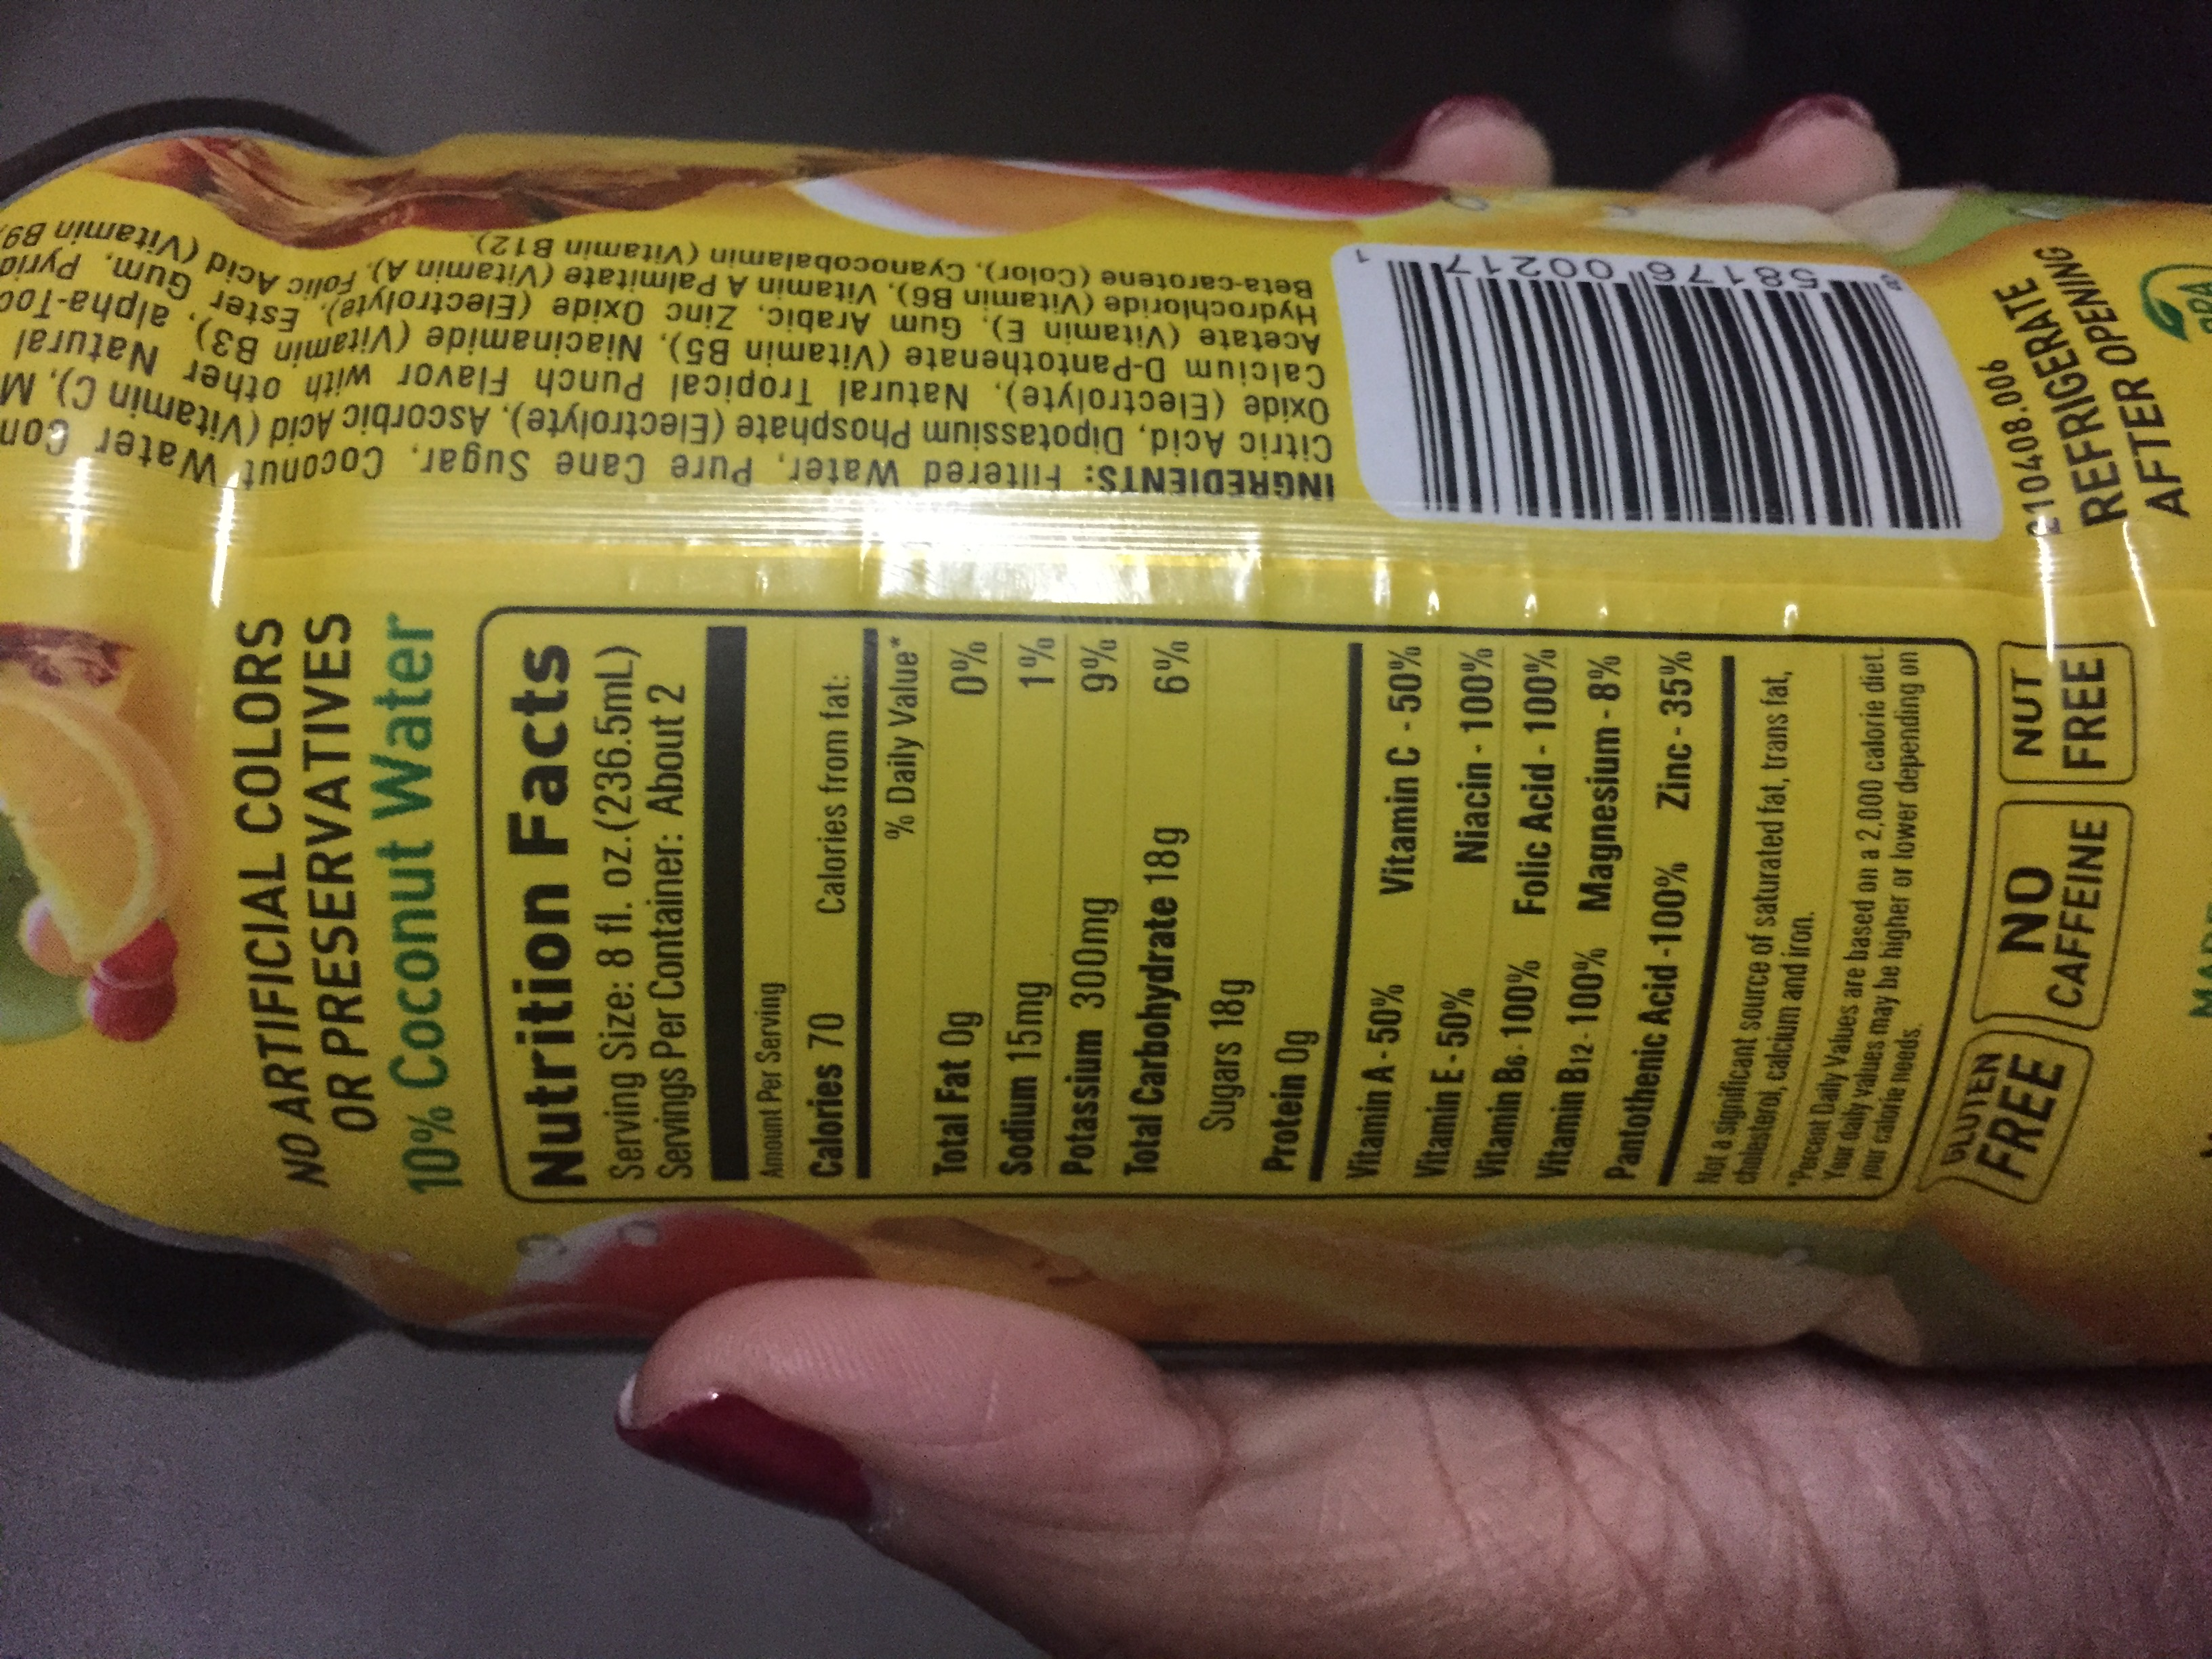 Body Armor Drink Nutrition Label : armor, drink, nutrition, label, Armor, Drink, Nutrition, Label, Labels, Design, Ideas